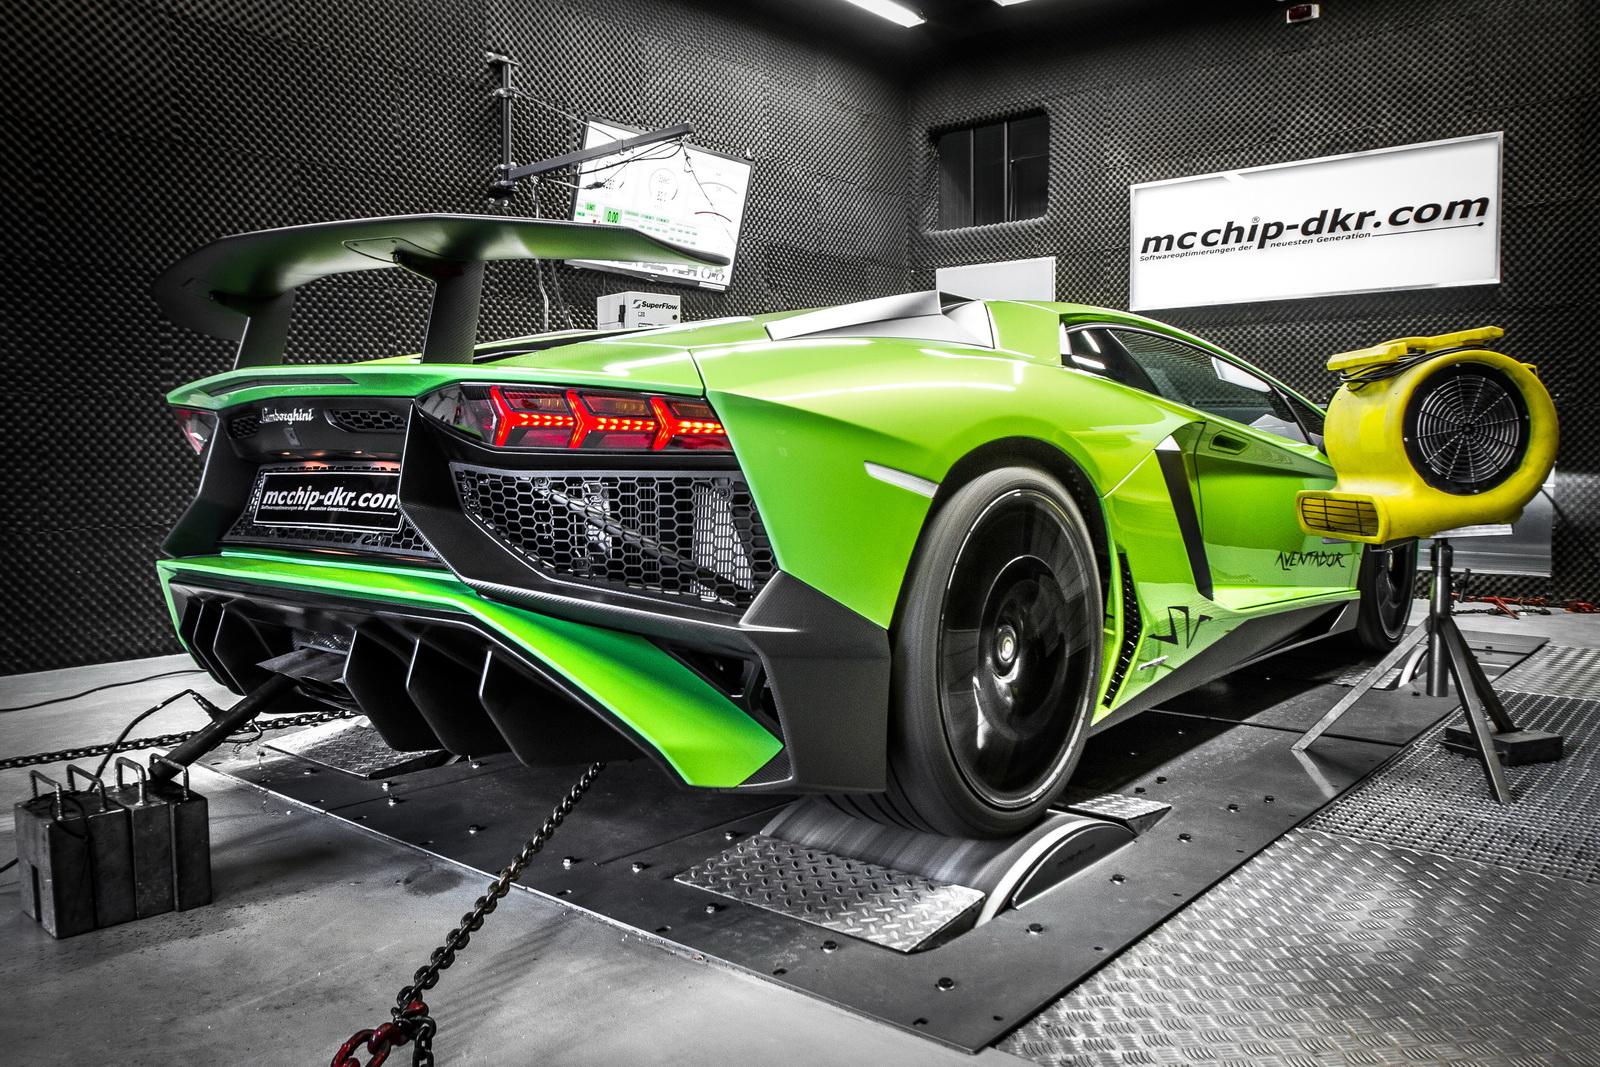 Lamborghini_Aventador_SV_by_Mcchip-DKR_20